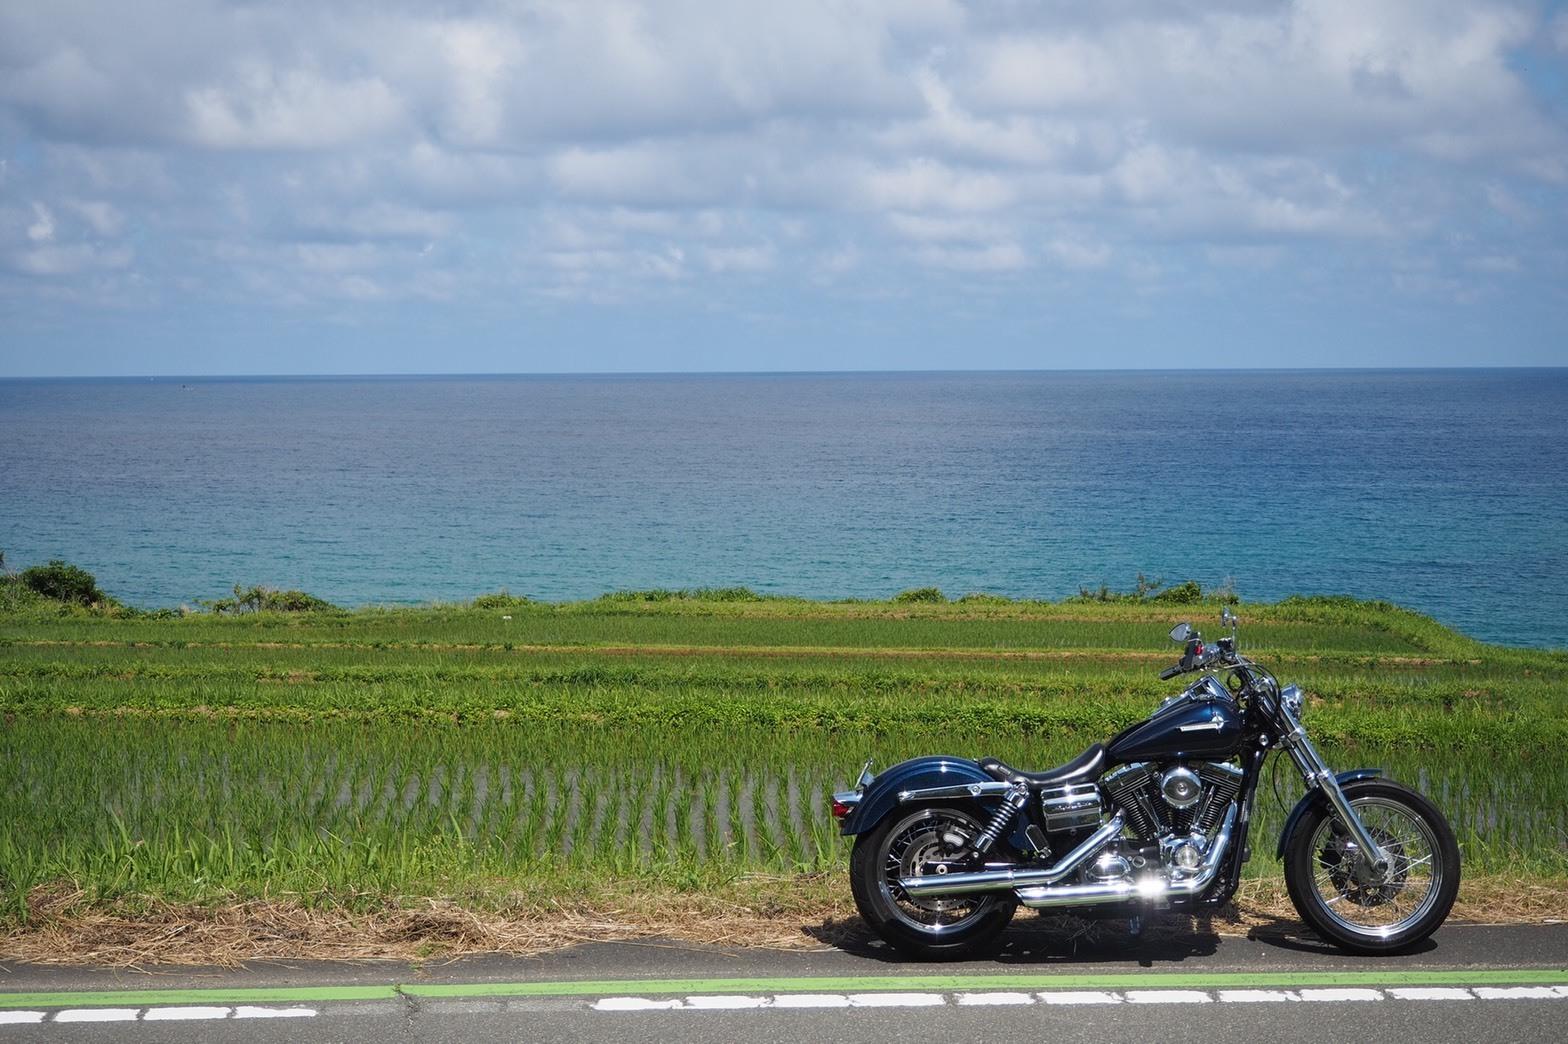 harleydavidson-motorcycle-touring-blog-kyoto-tanngopeninsula-coastline-ricefield.jpg